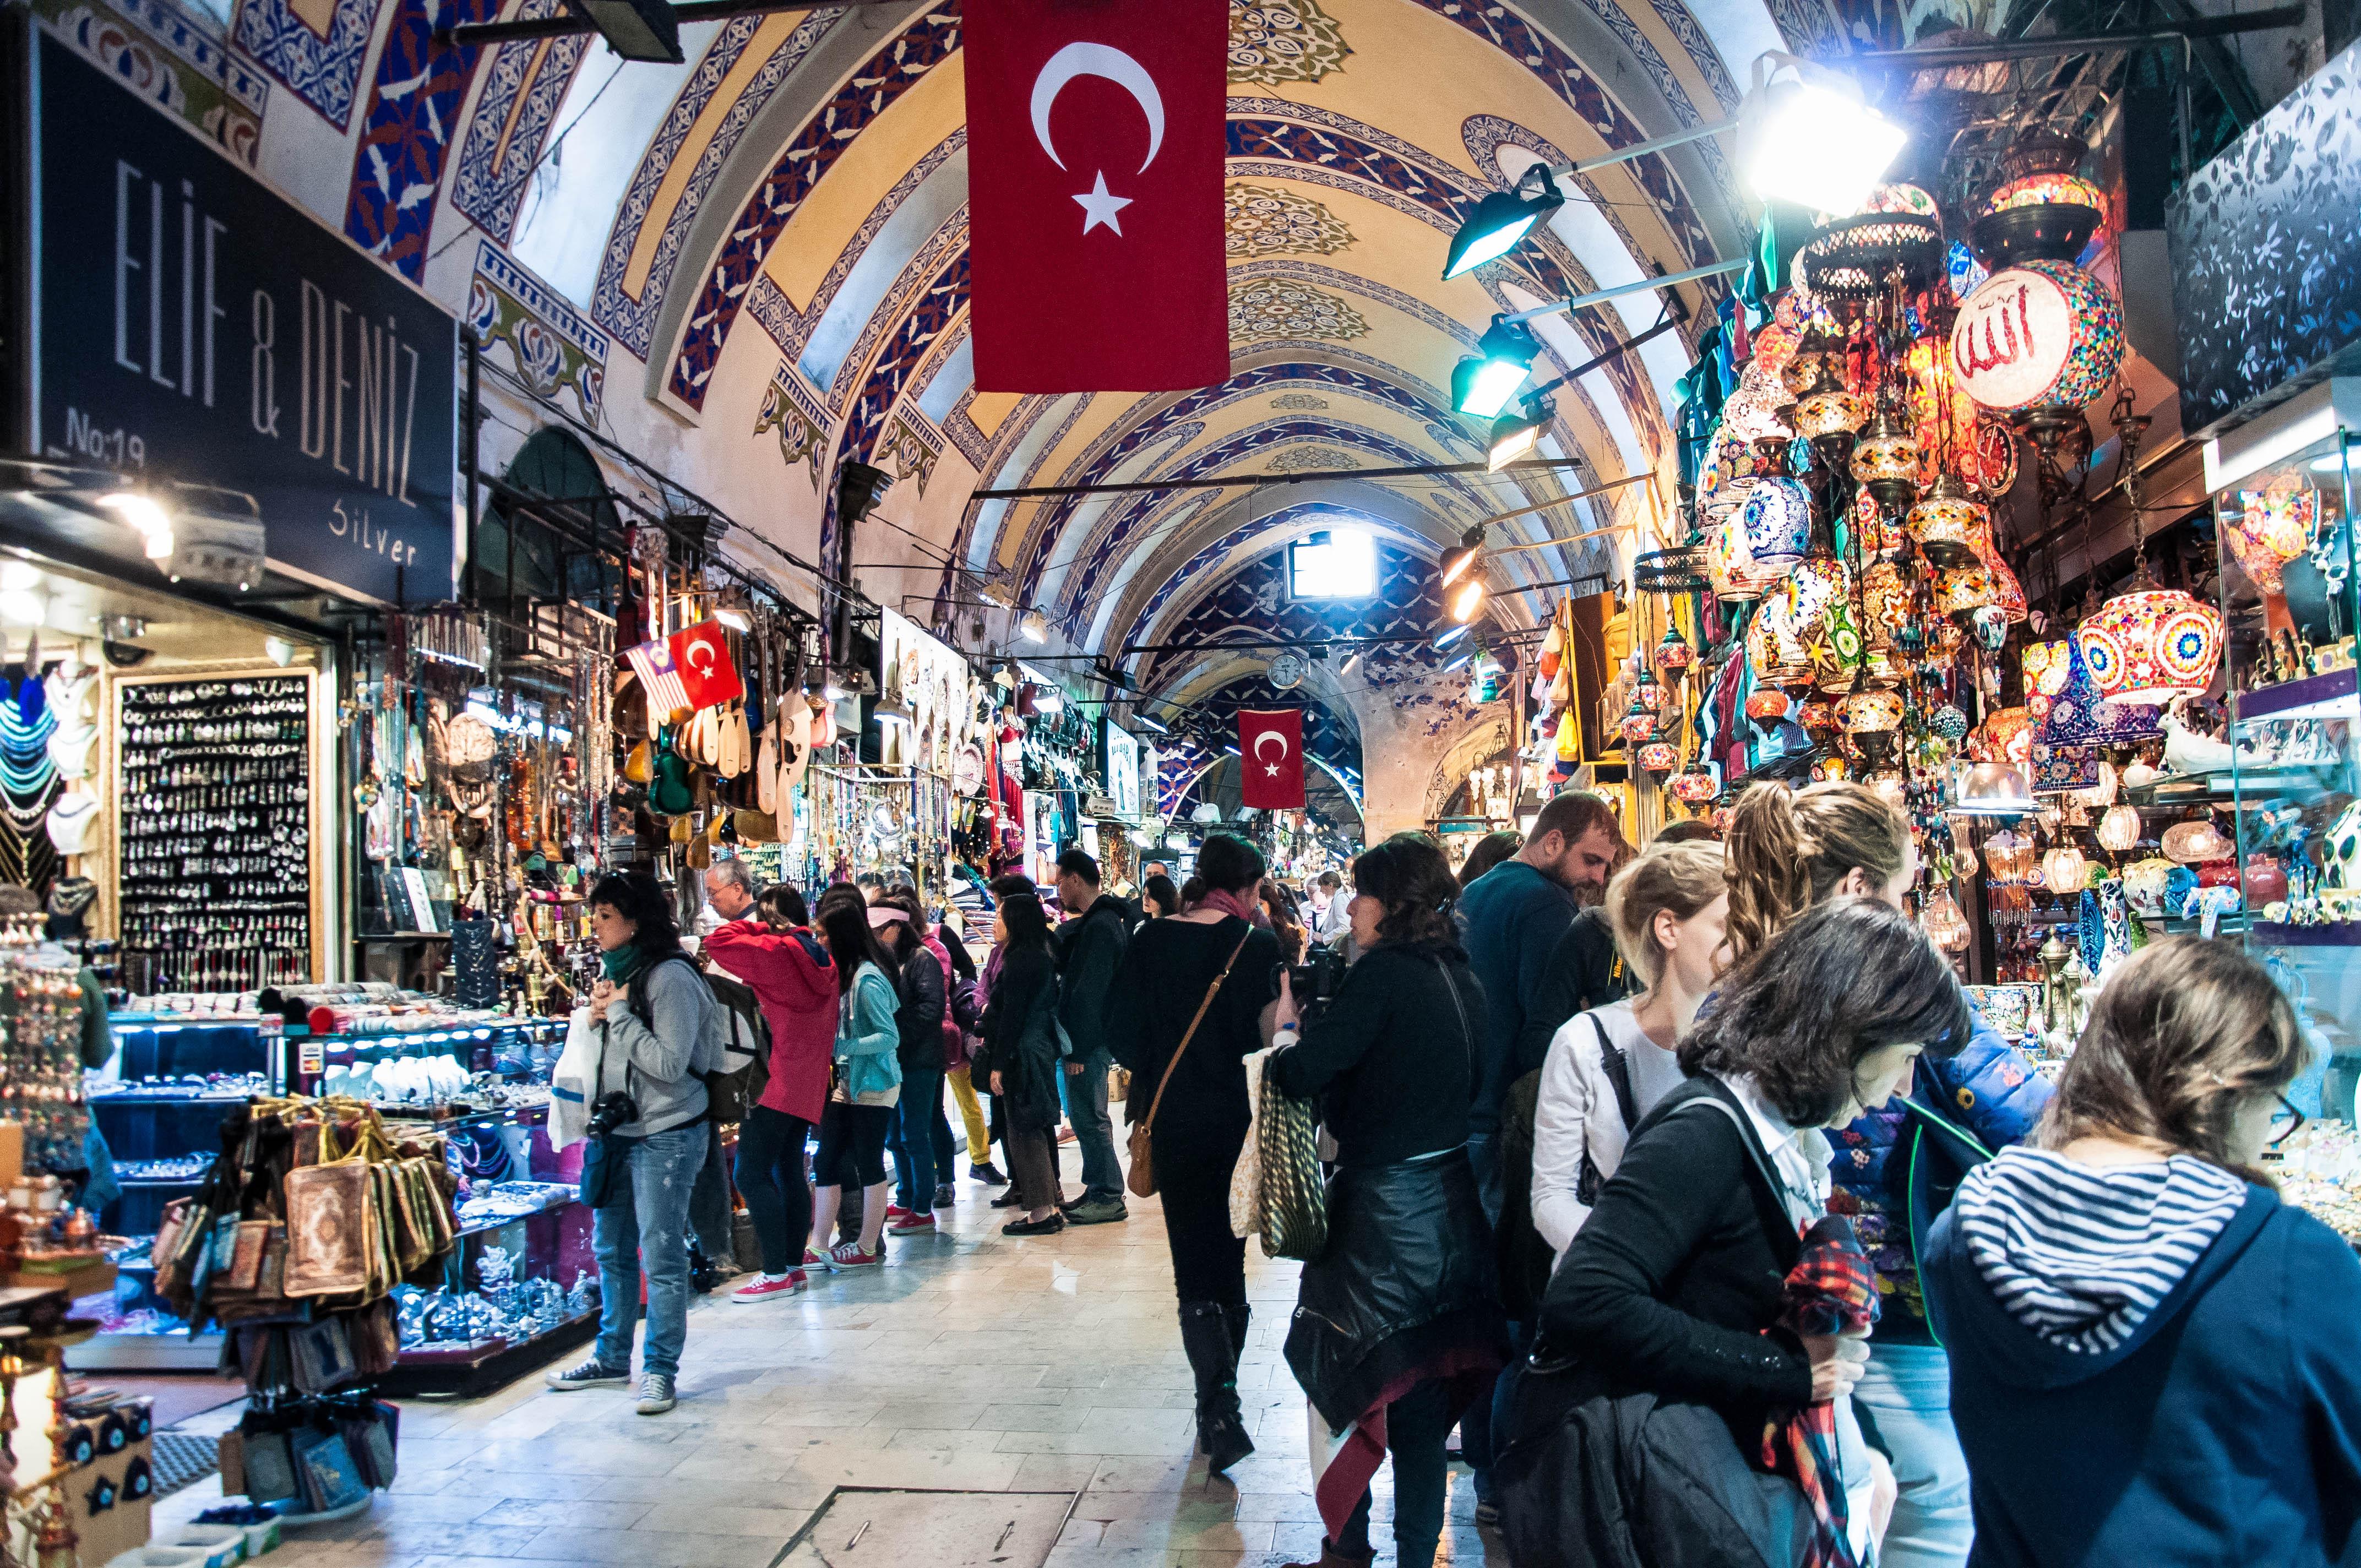 Flickr - Schegge di Istanbul, Gran Bazar